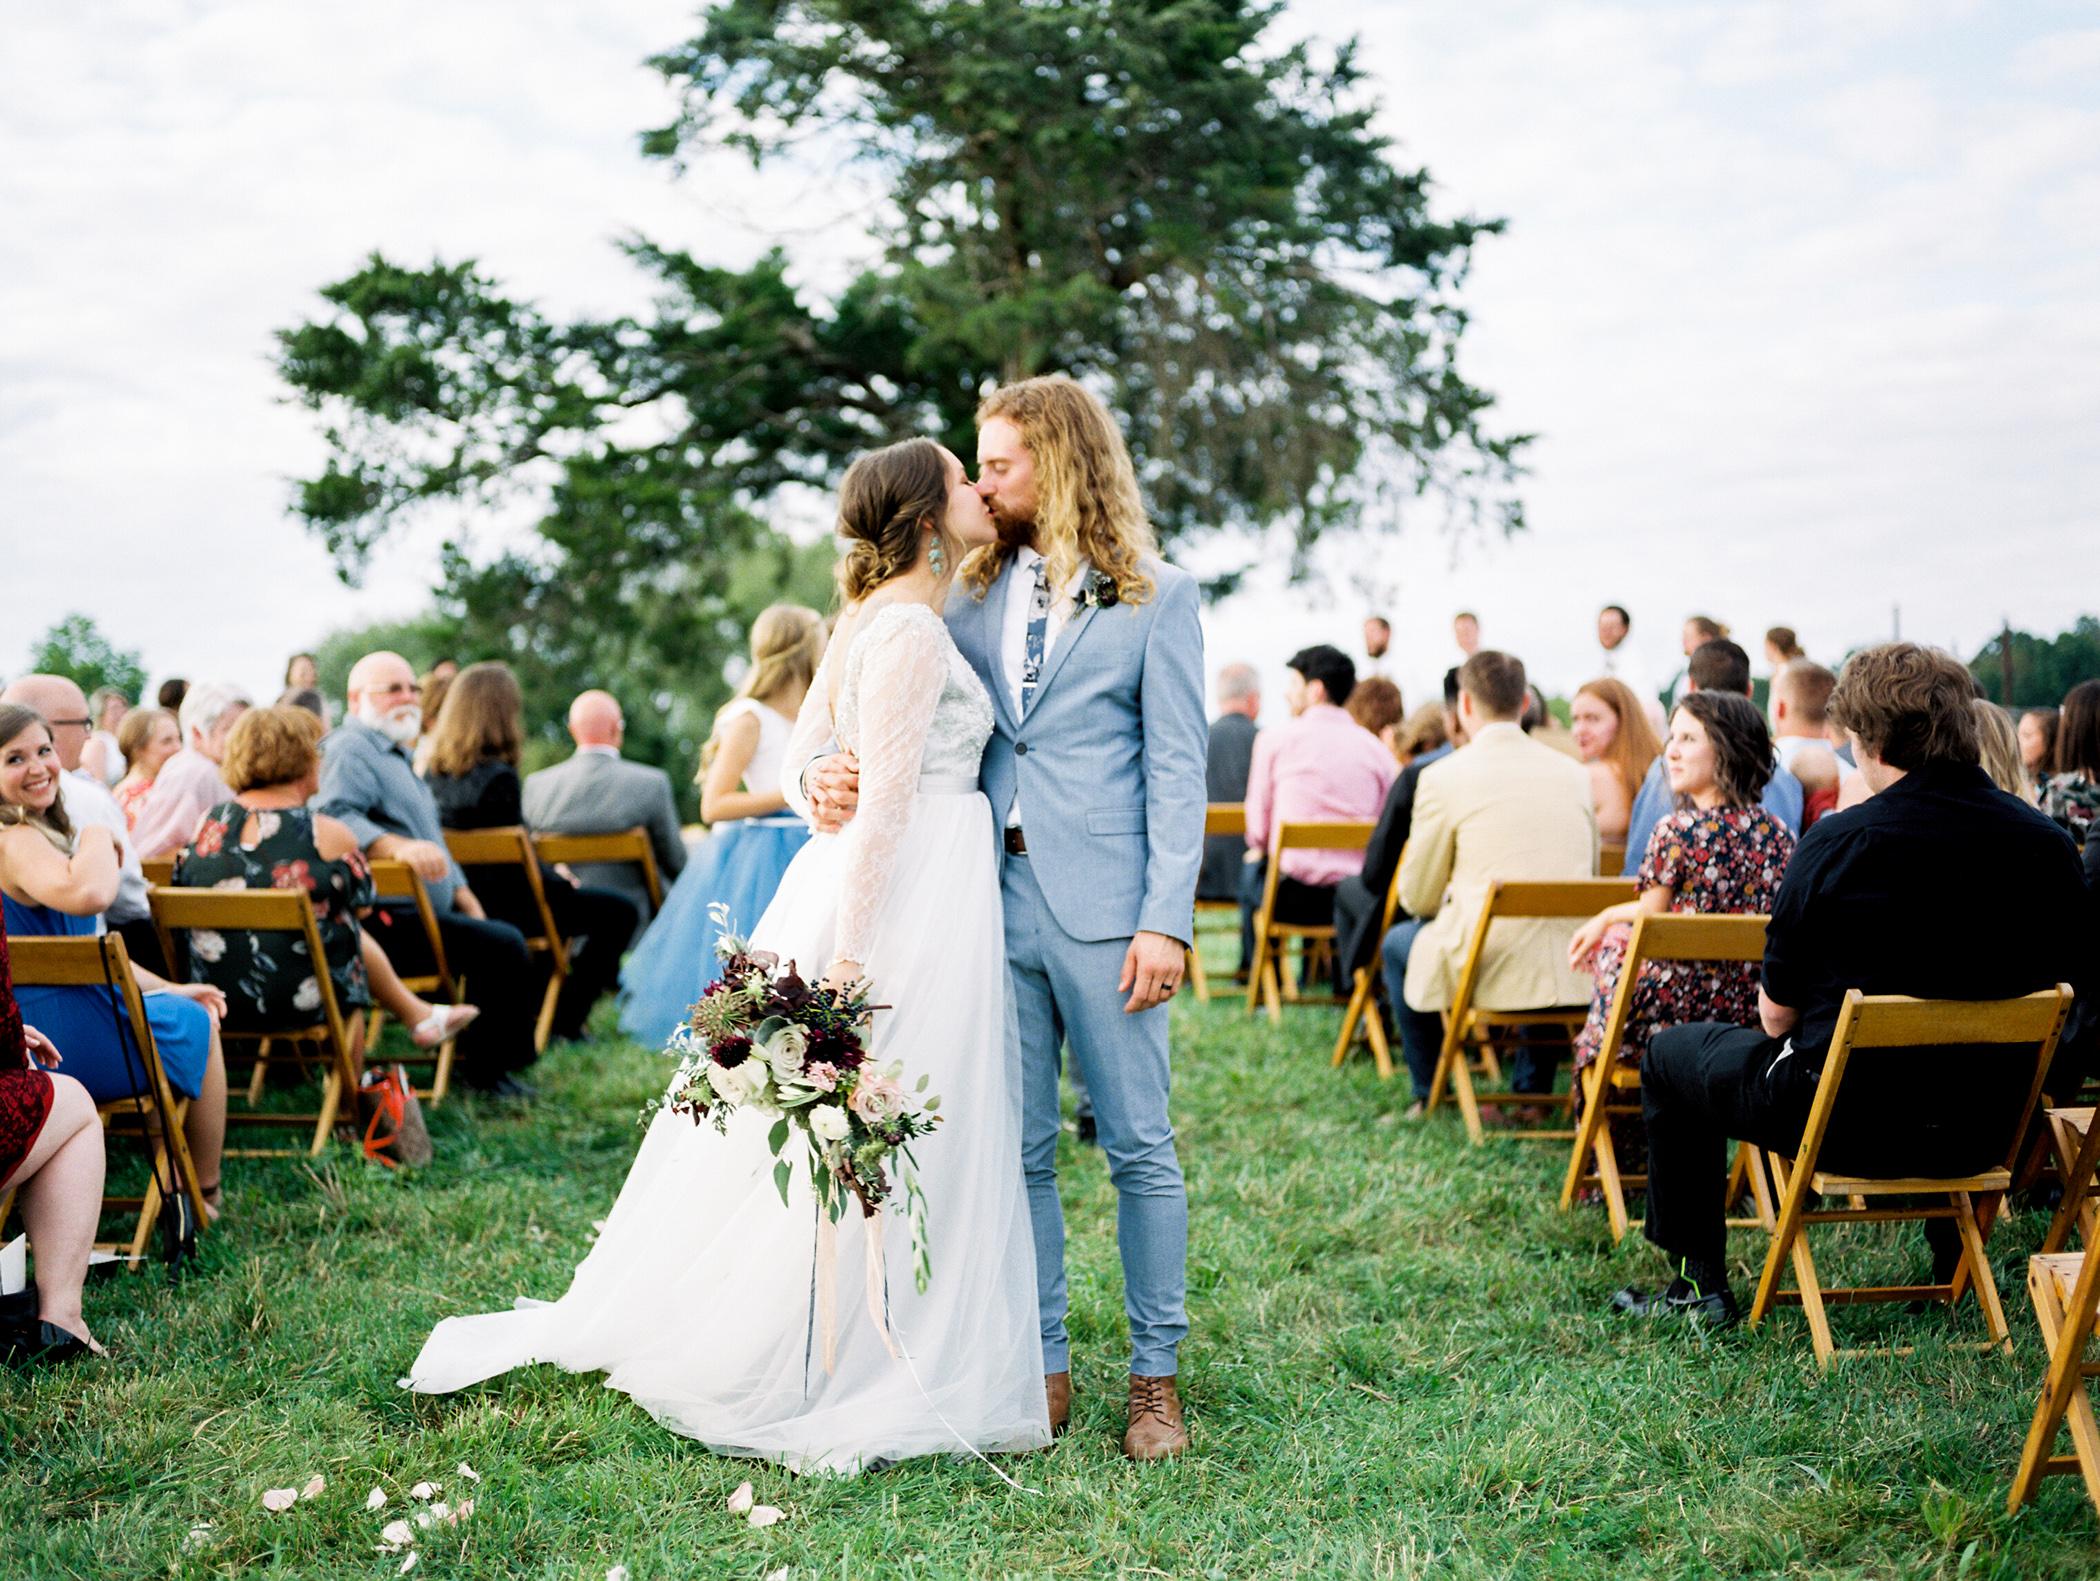 Charlotte-Film-Wedding_Photographer-heartstone-lodge-virginia-26.jpg